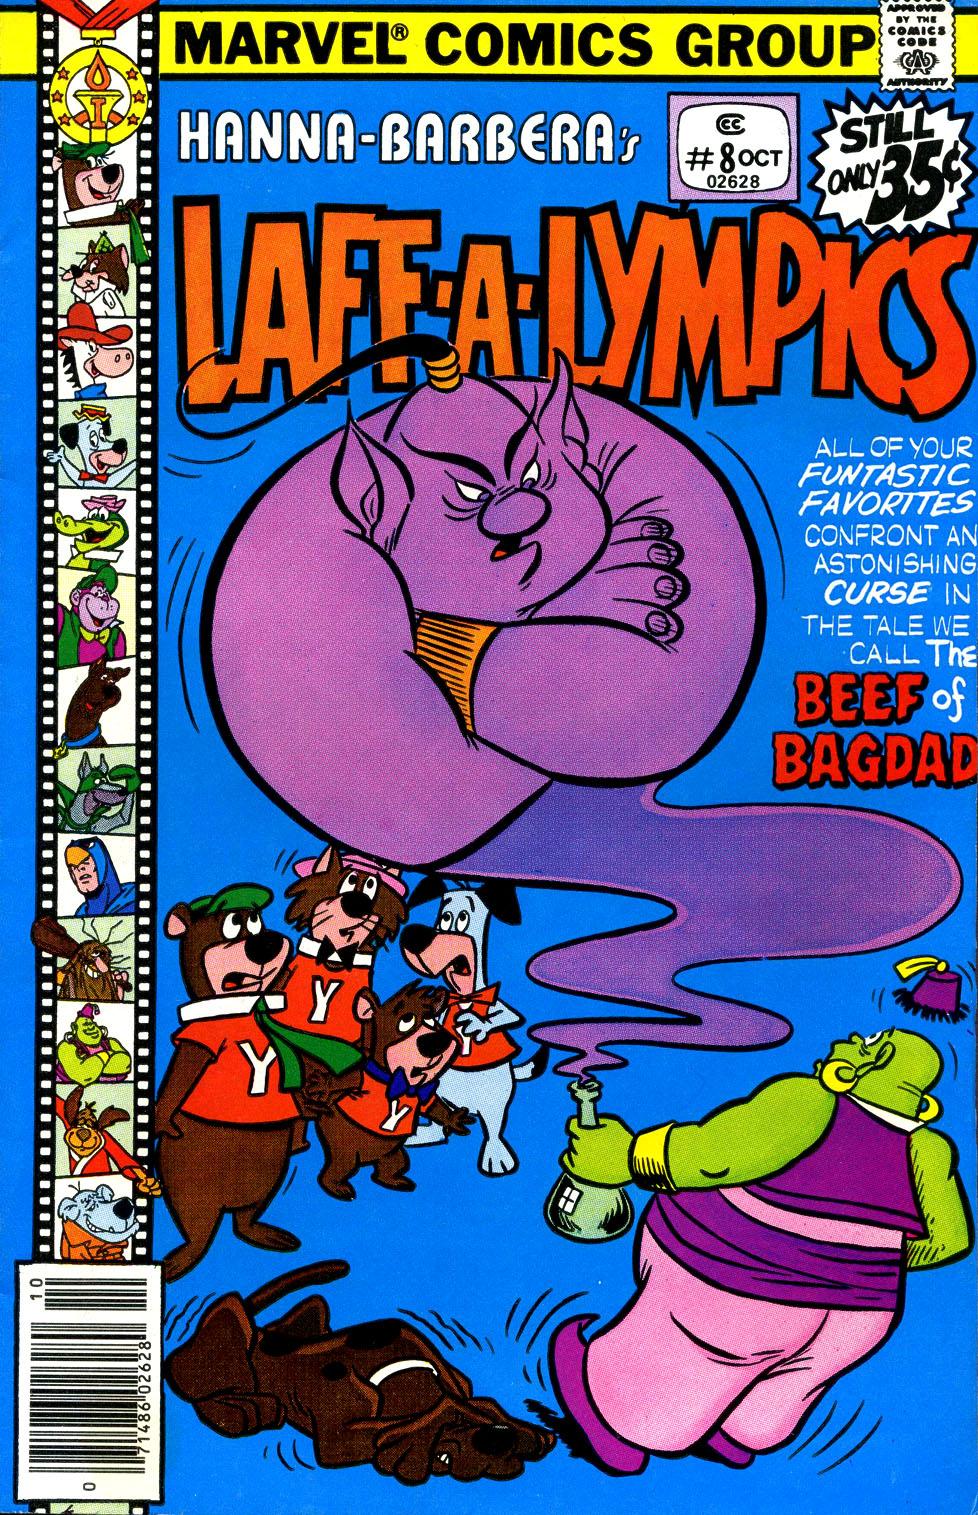 Laff-a-lympics 8 Page 1